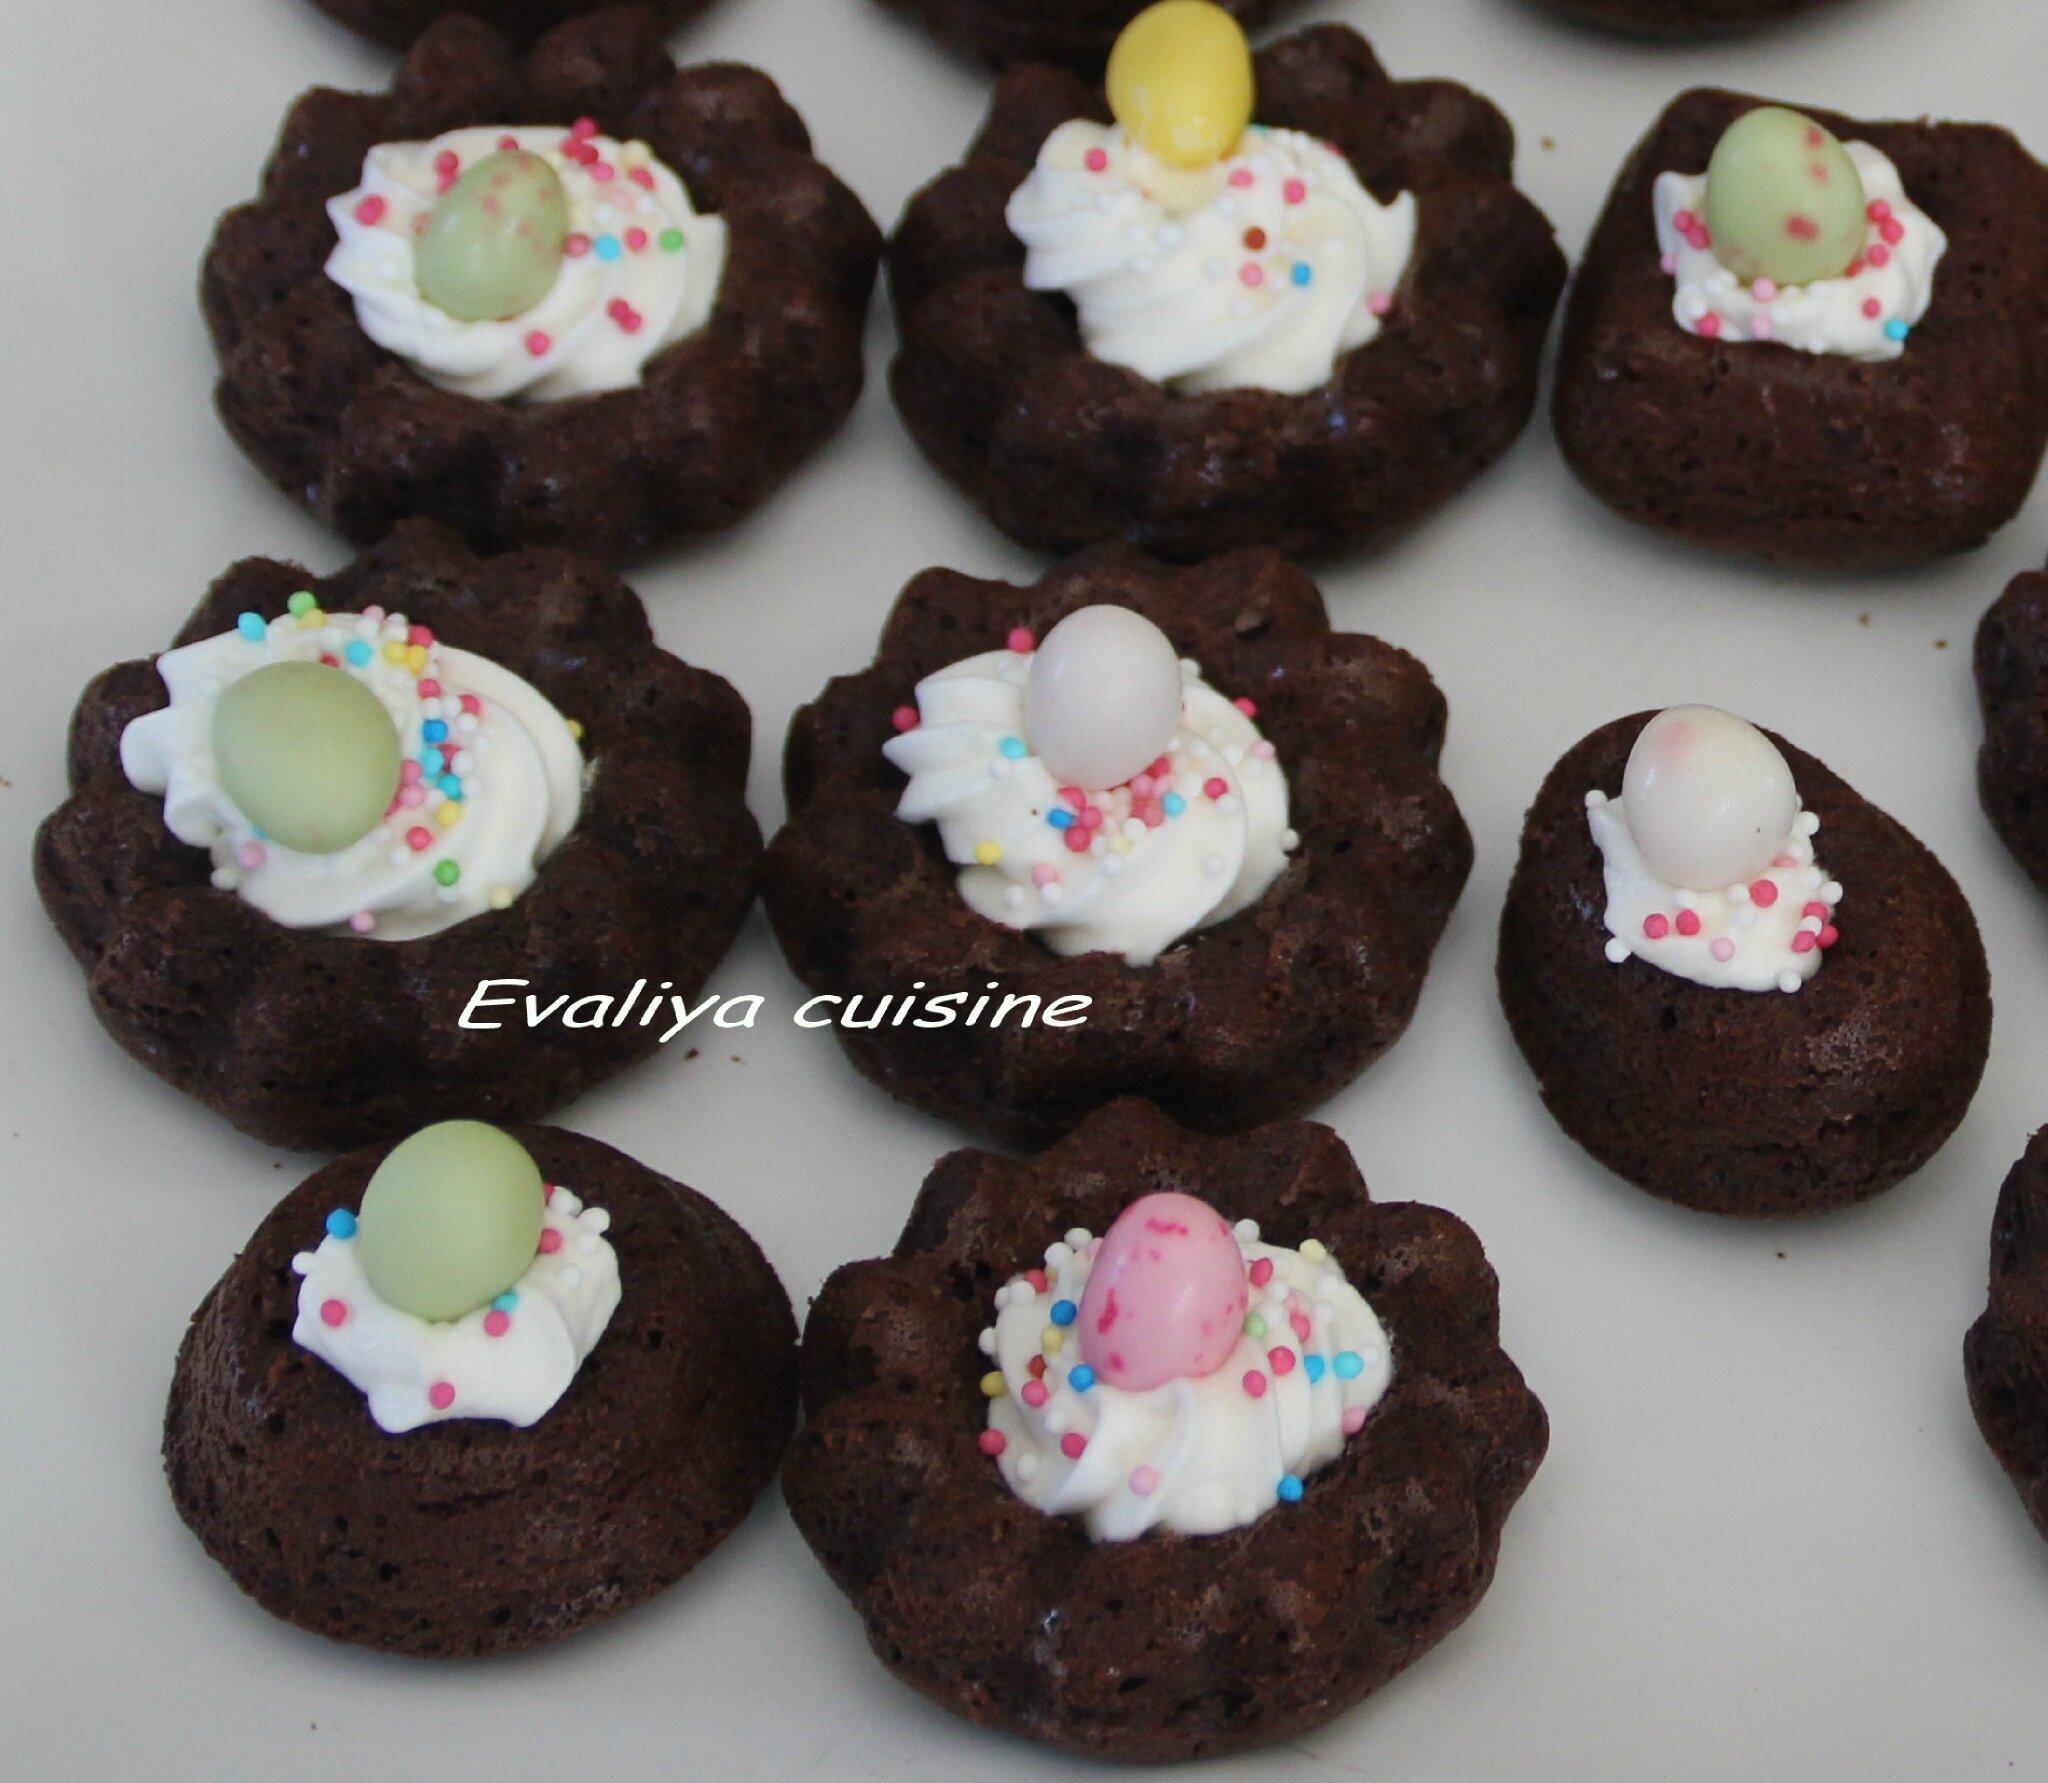 PETITS NIDS CHOCOLAT-FEVE TONKA